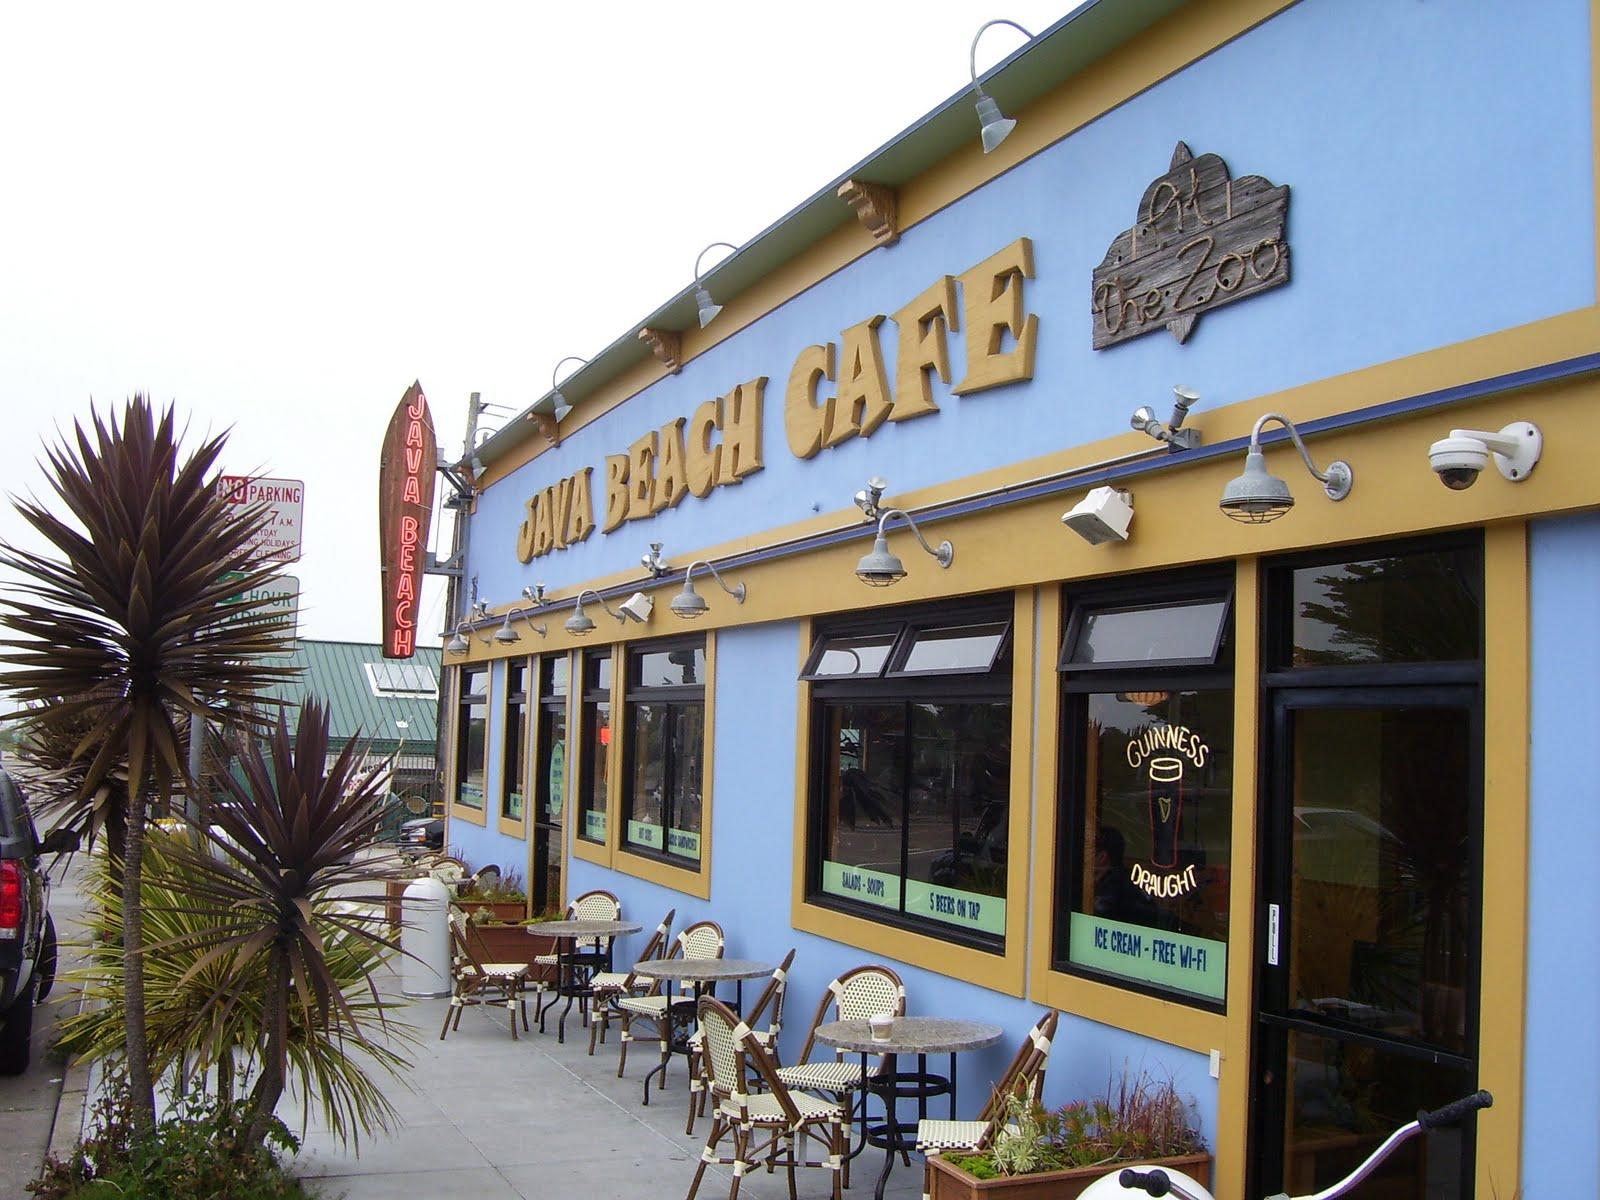 Top-quality coffee, lunch fare and sweets make Java Beach a favorite destination near Ocean Beach.